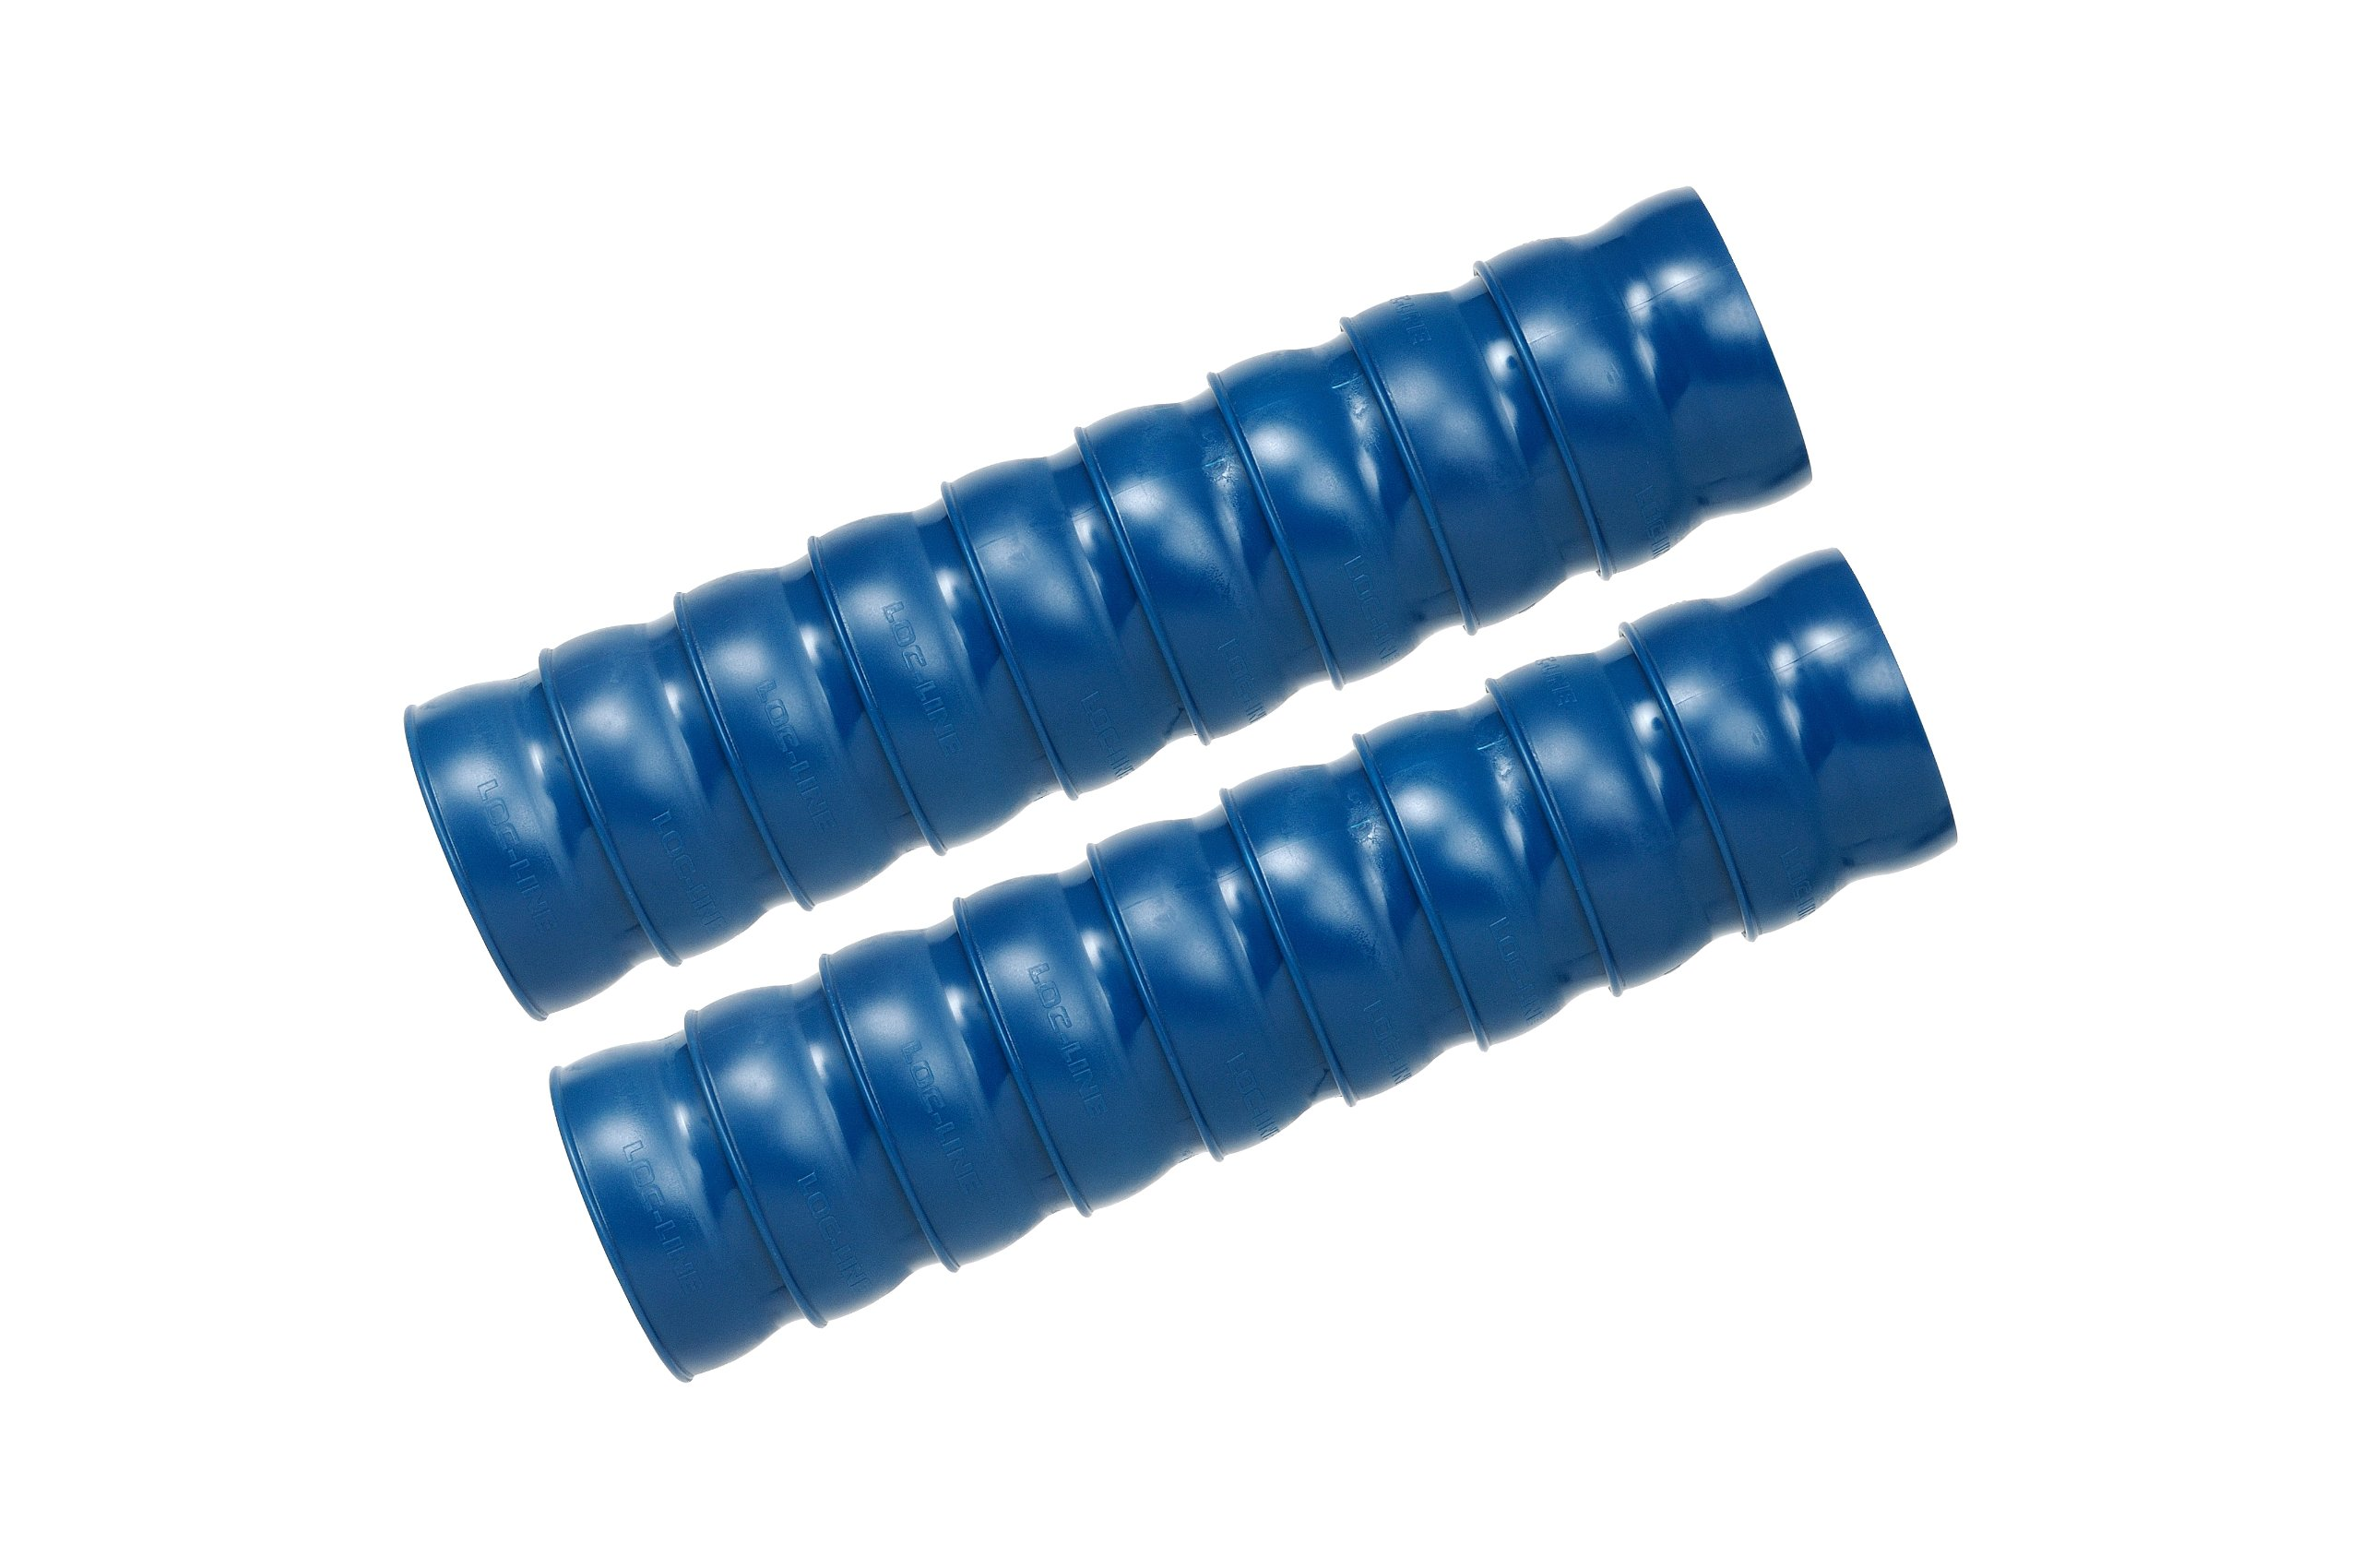 Loc-Line Vacuum Hose Component, Blue Acetal Copolymer, 2-1/2'' ID, 2 x 12'' Length Segments (18 elements total)